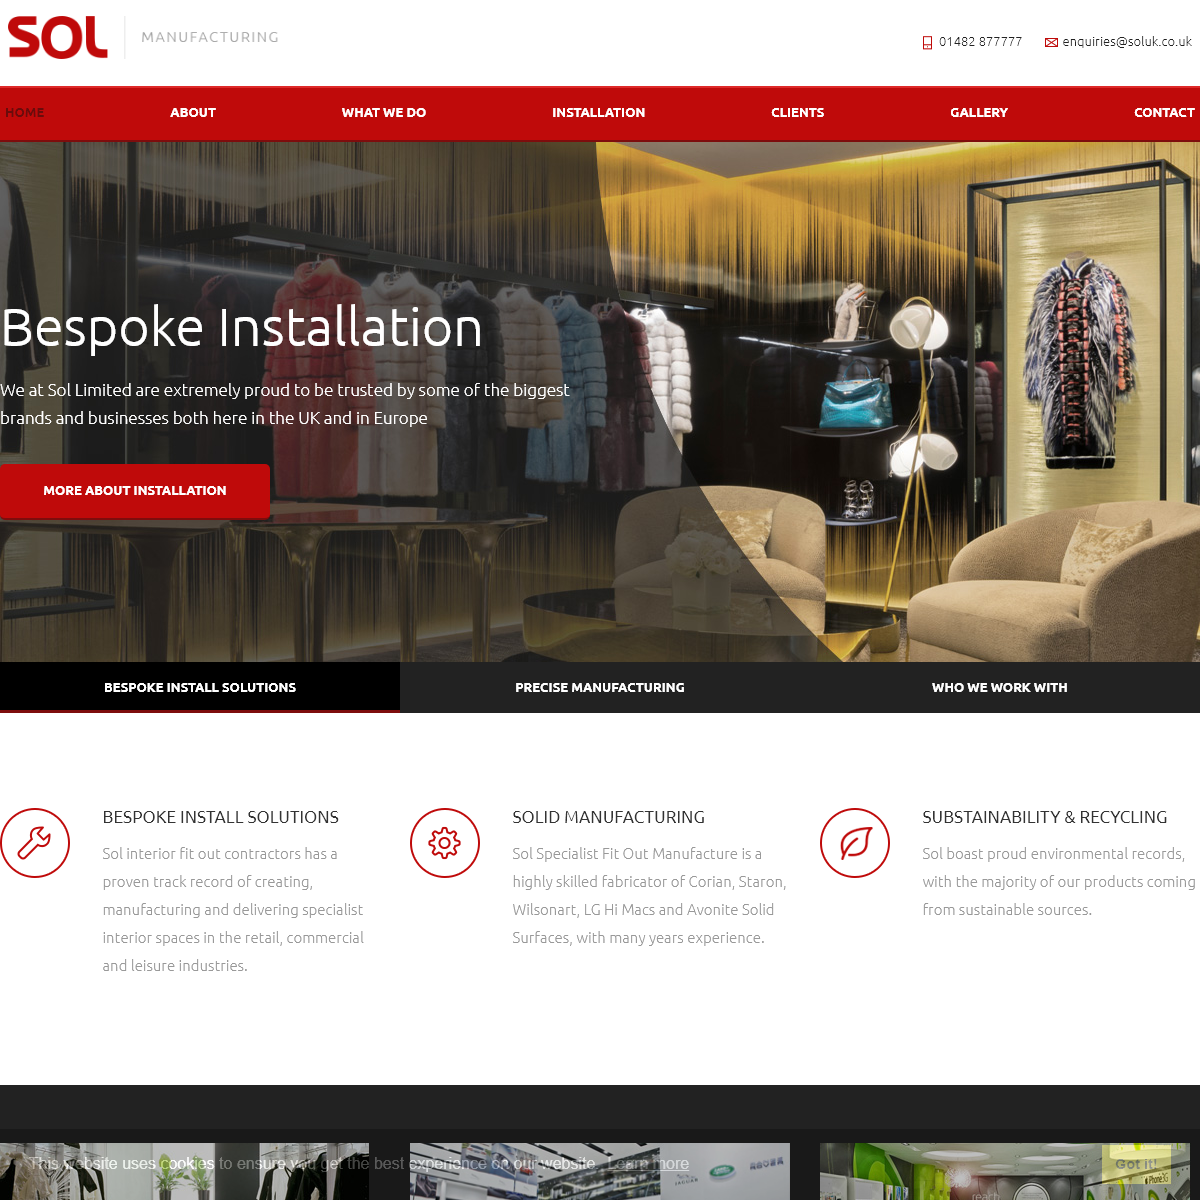 Interior fit out contractors - SOL UK